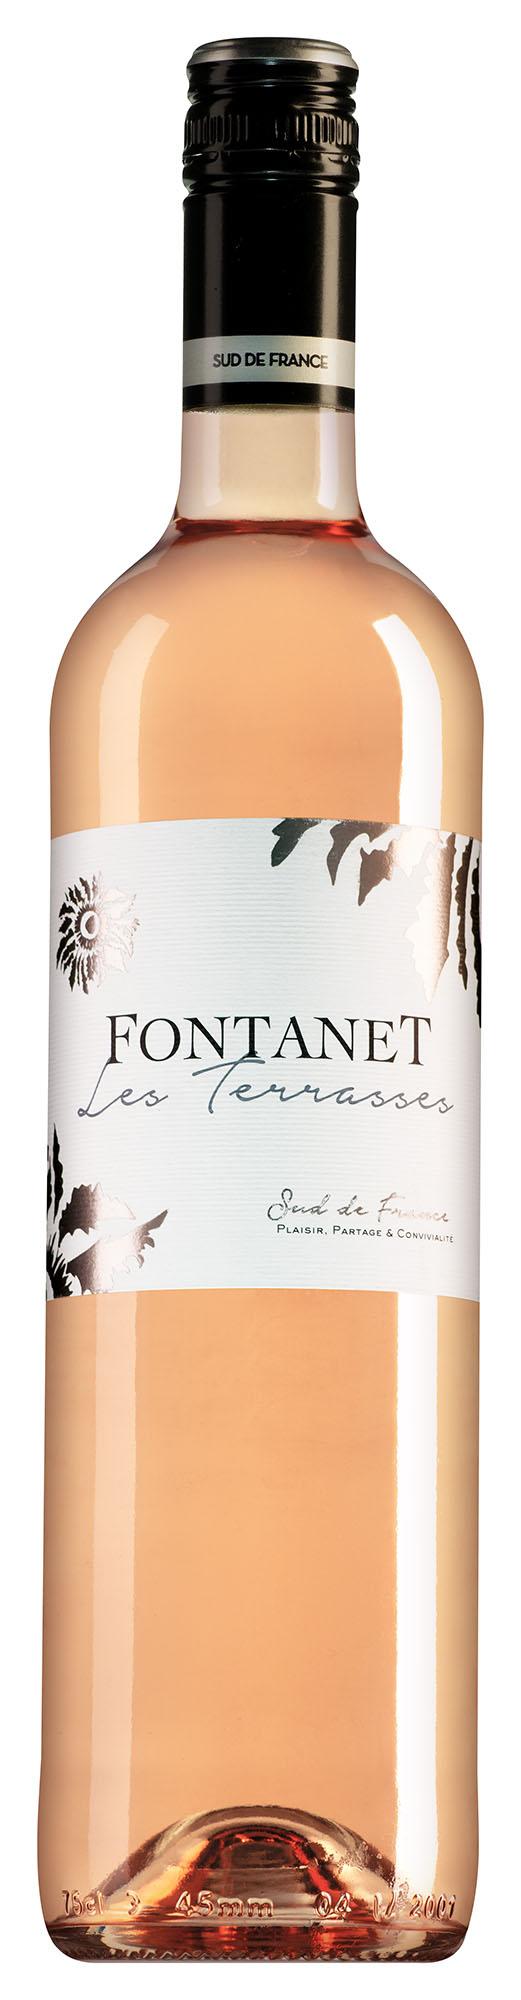 Fontanet Pays d'Oc Les Terrasses rosé